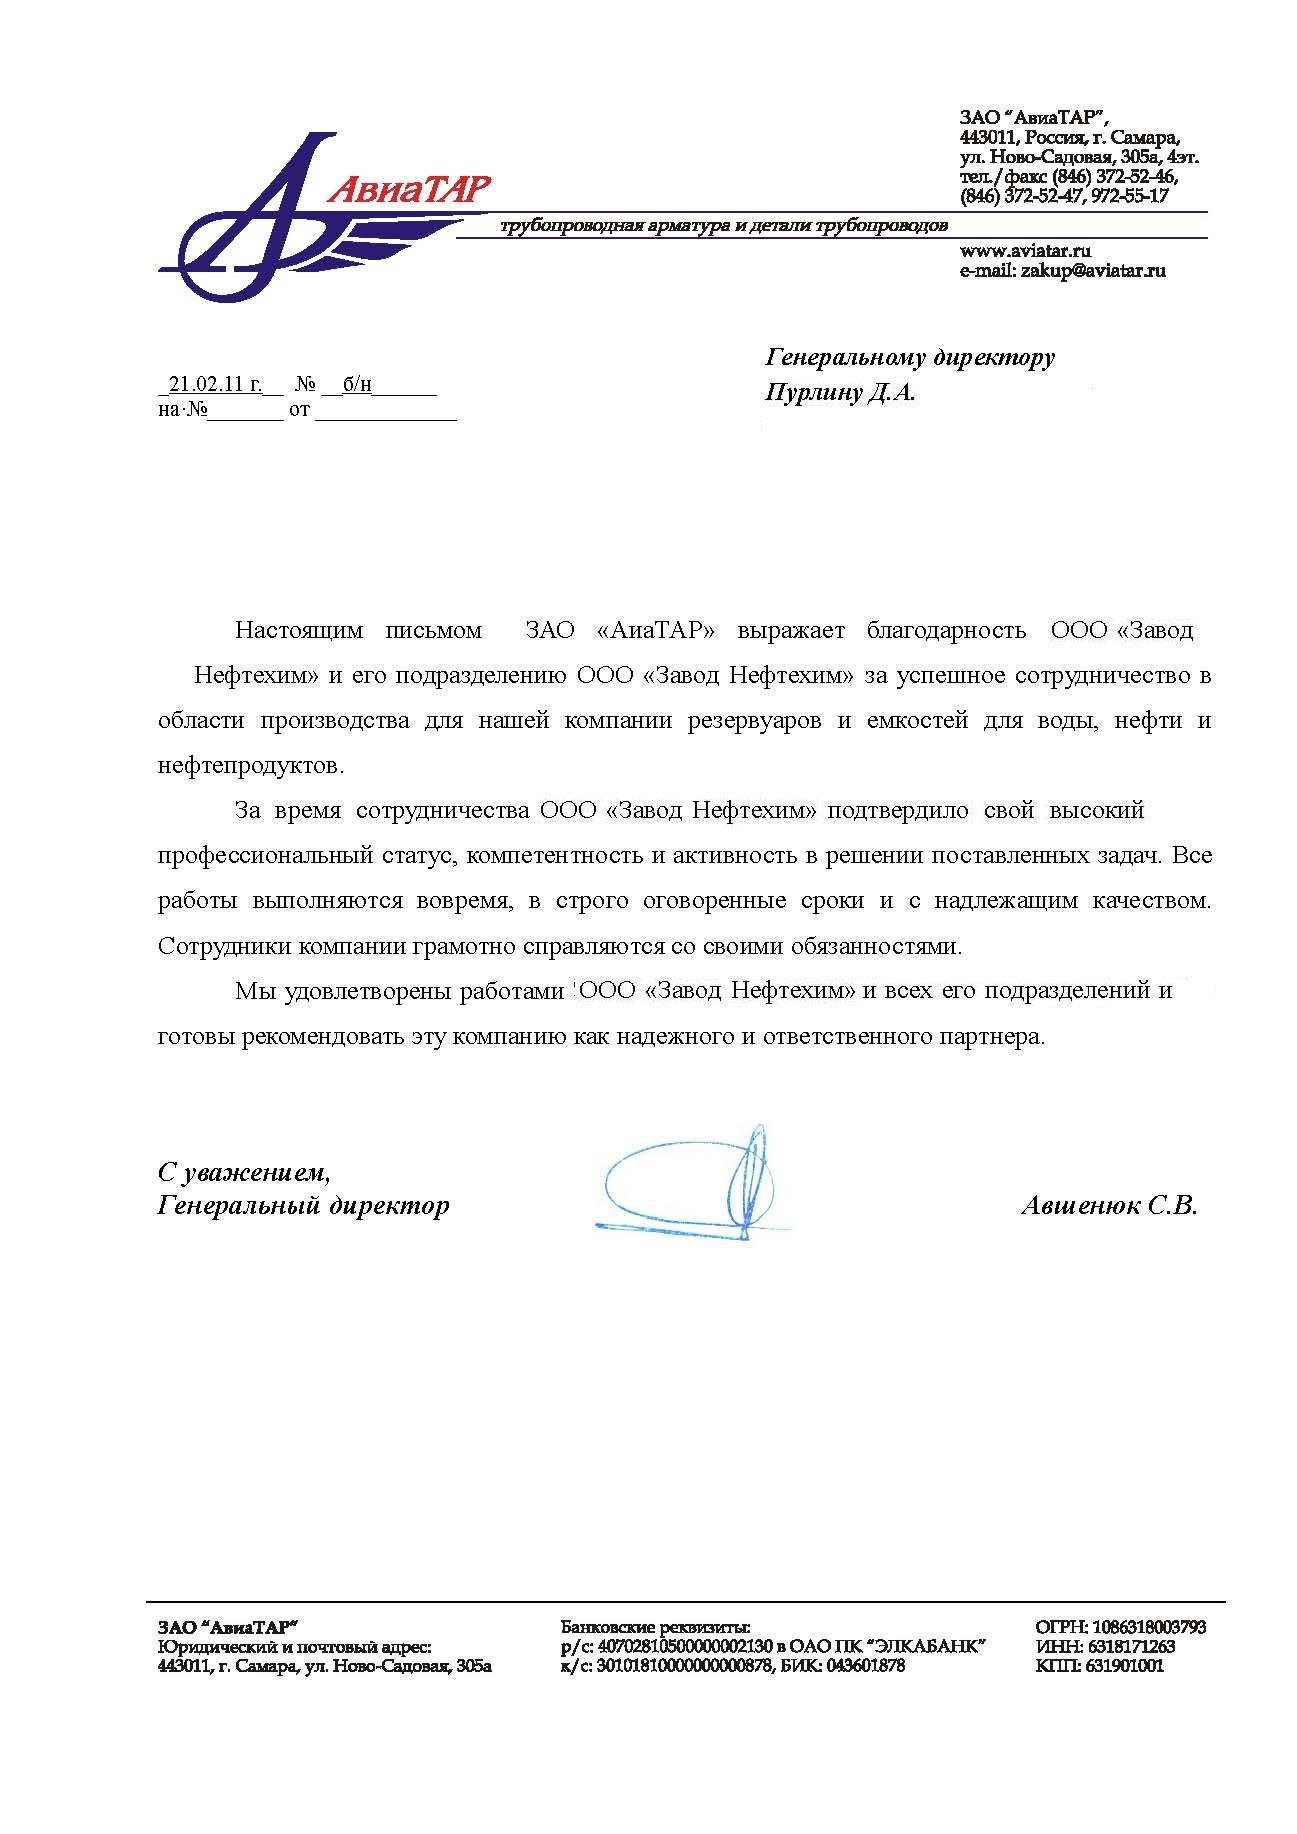 ОТЗЫВ ЗАО АвиаТАР